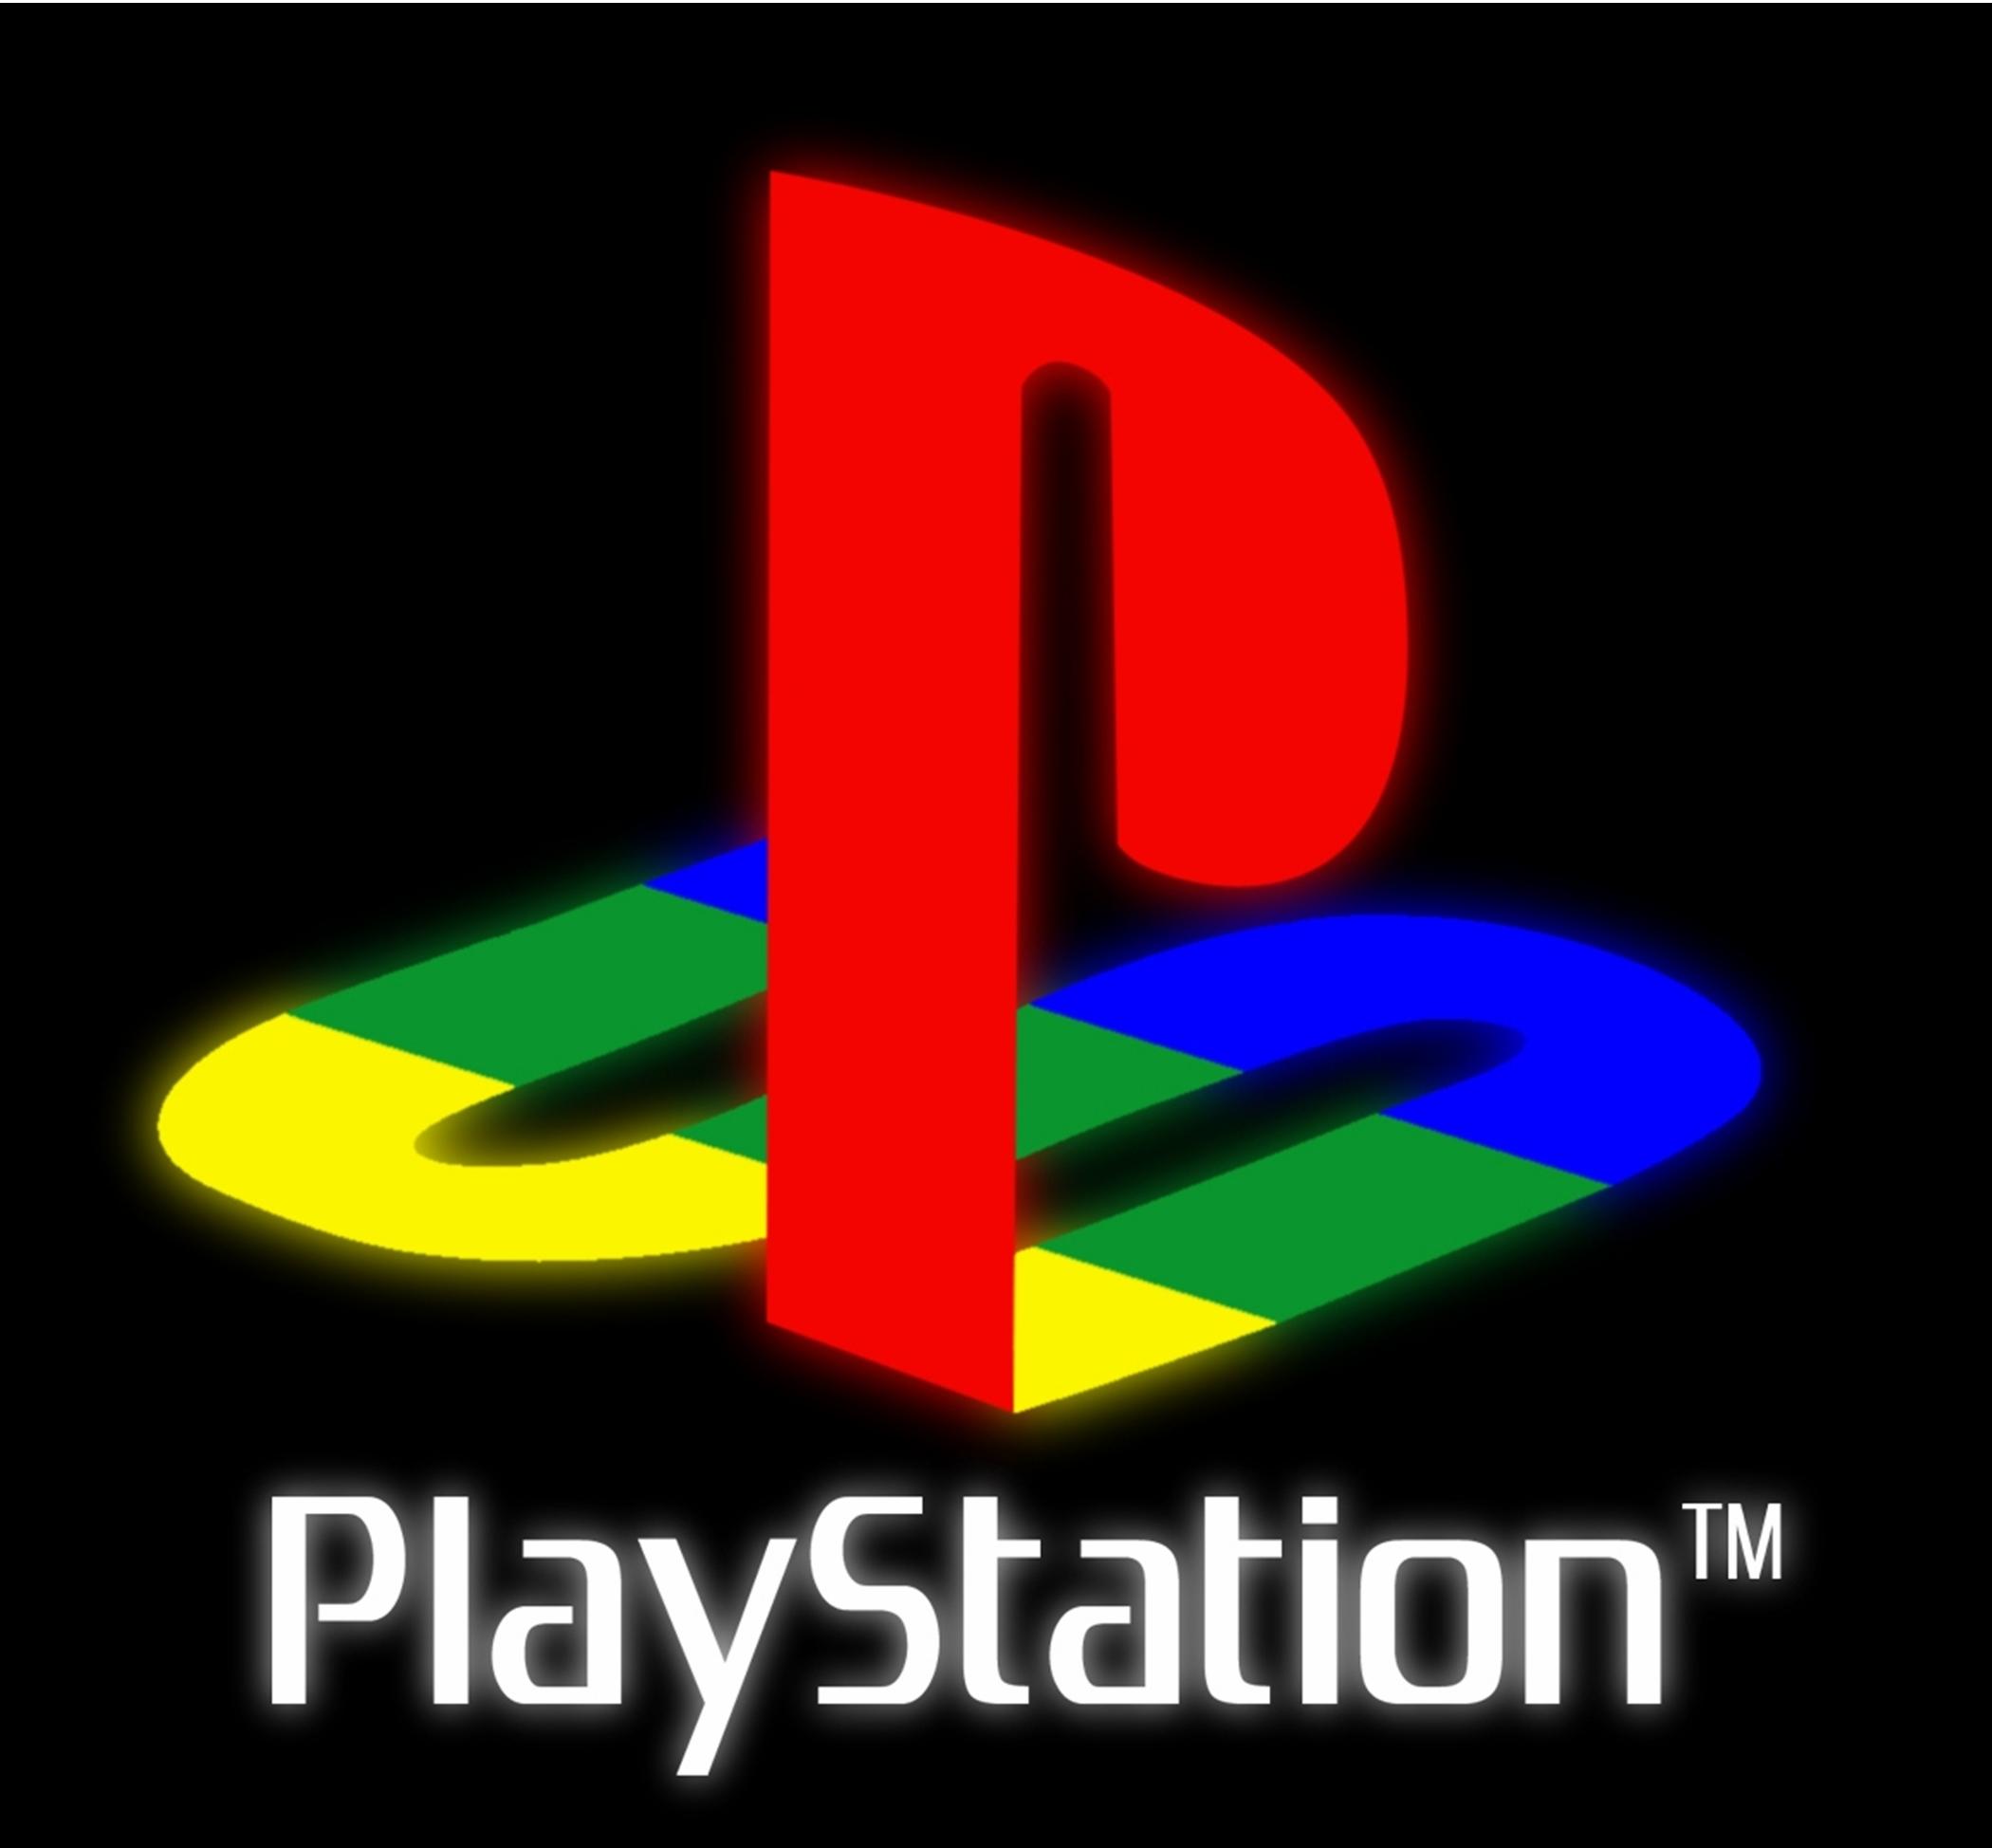 Playstation Credit Card Payment - Login